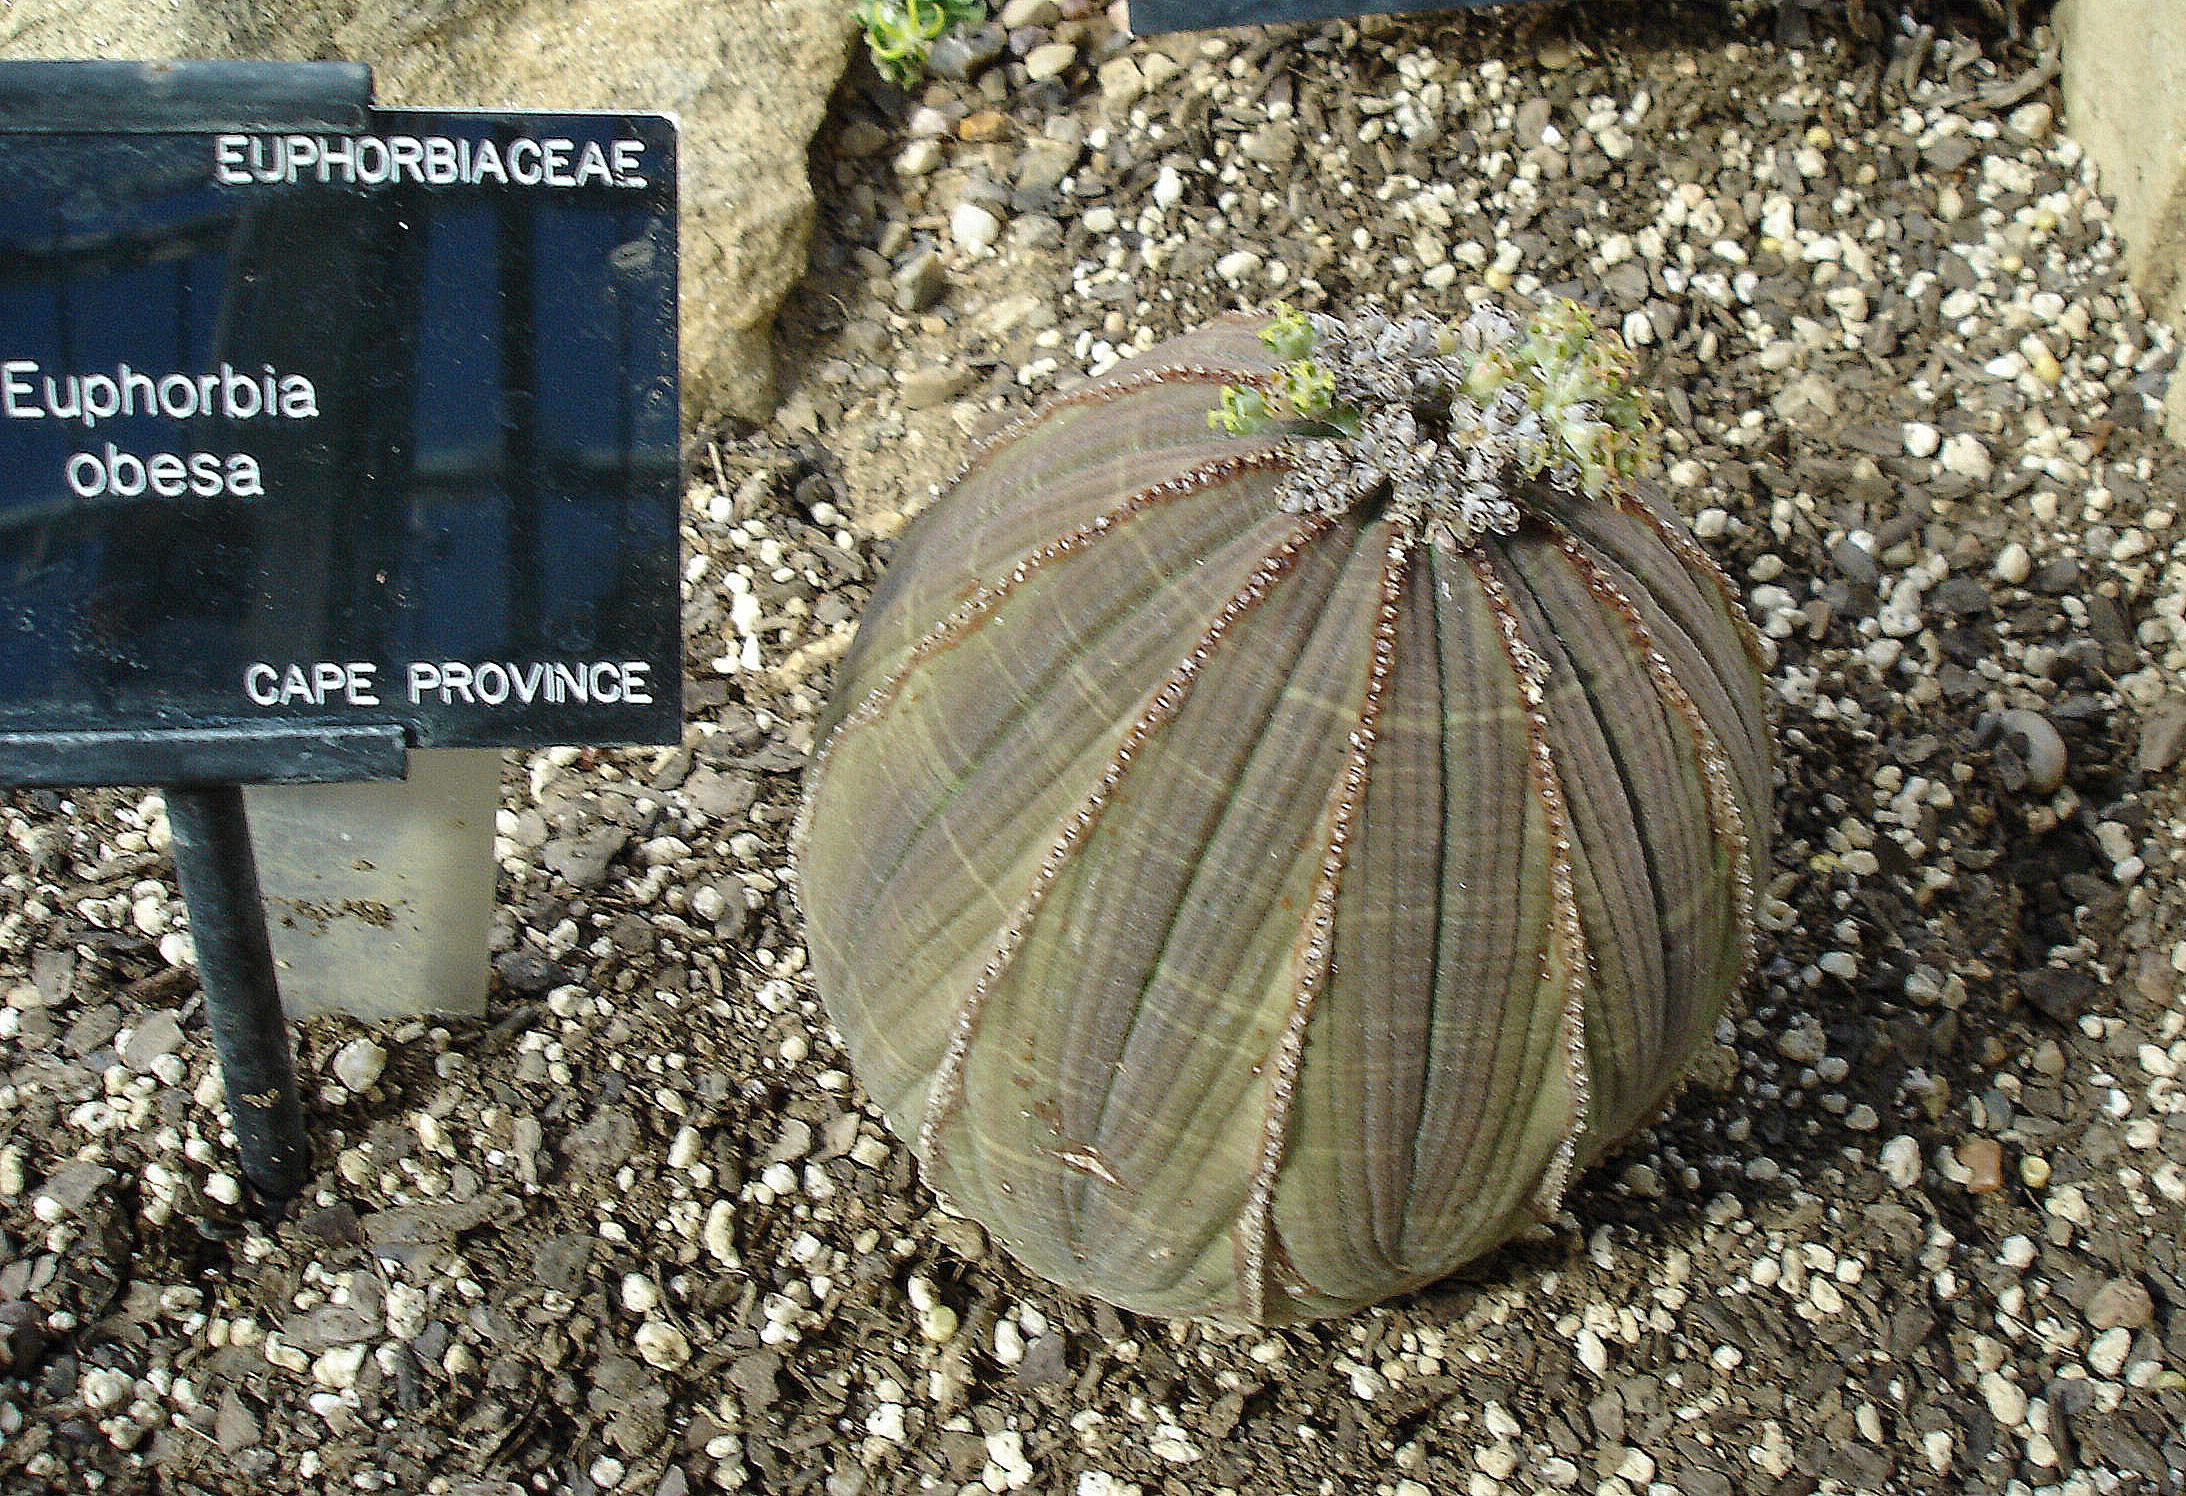 http://upload.wikimedia.org/wikipedia/commons/4/42/Euphorbia_obesa.jpg